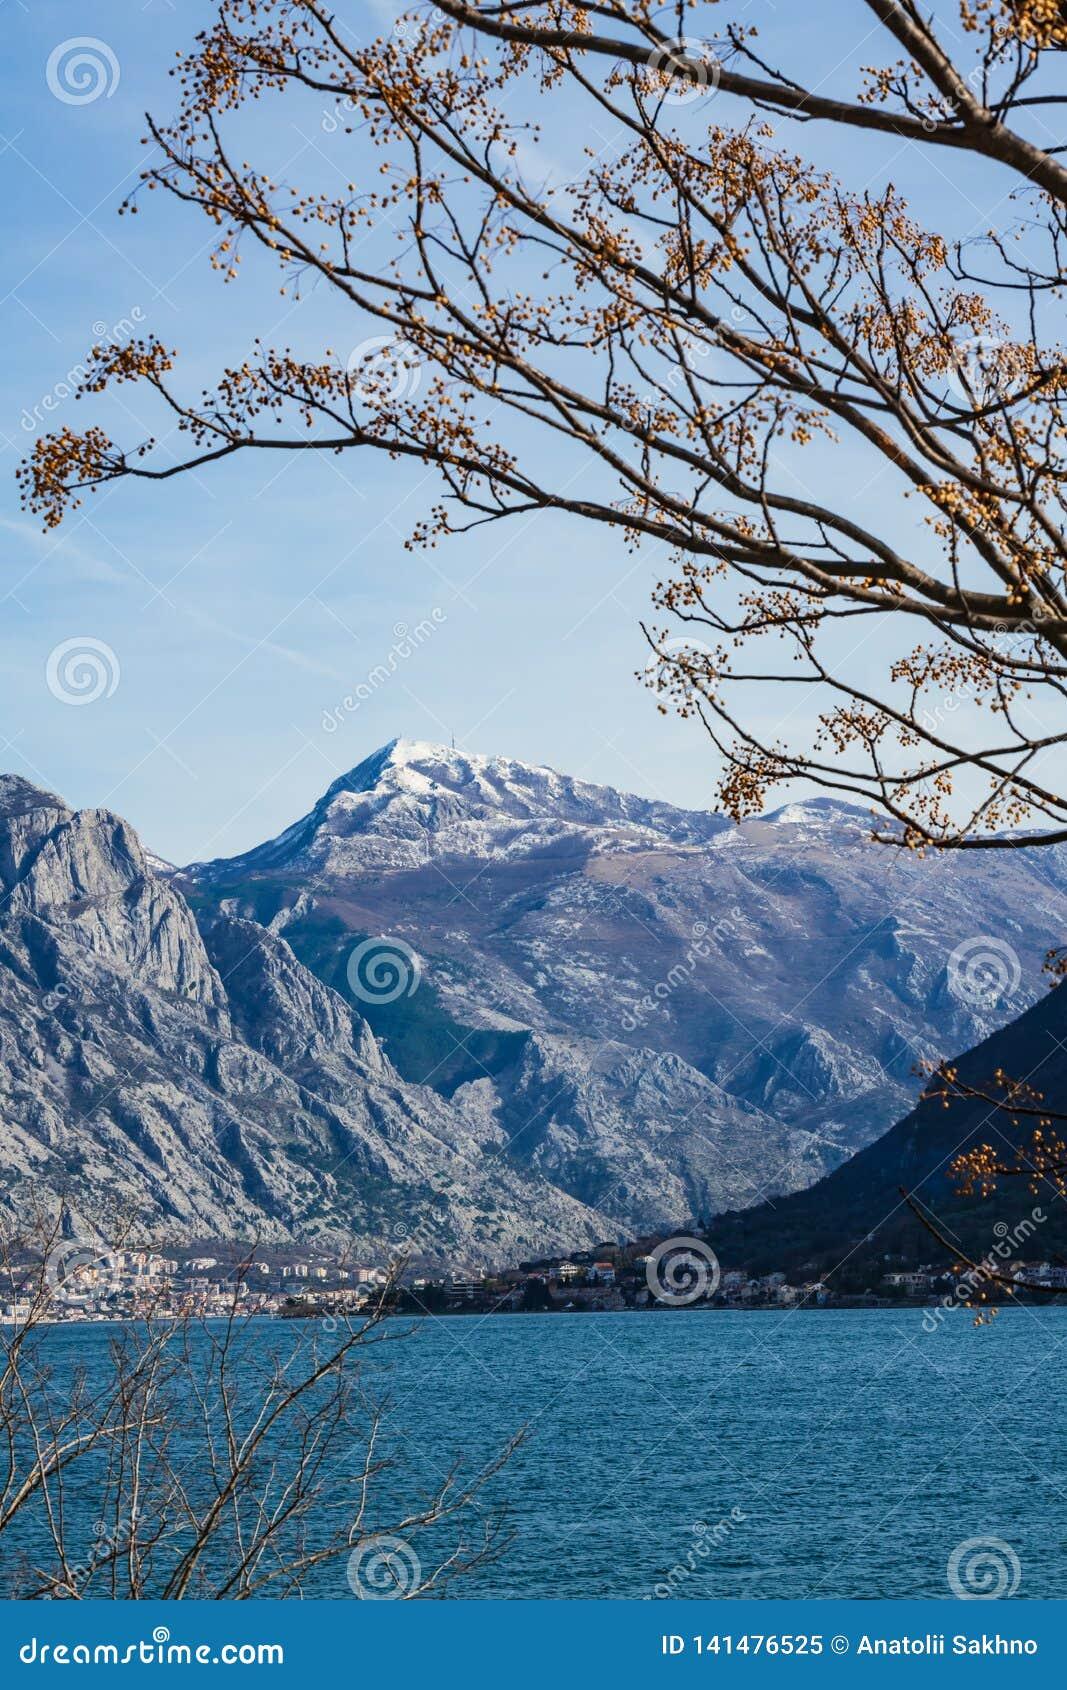 Ideia do pico nevado Lovcen em Montenegro